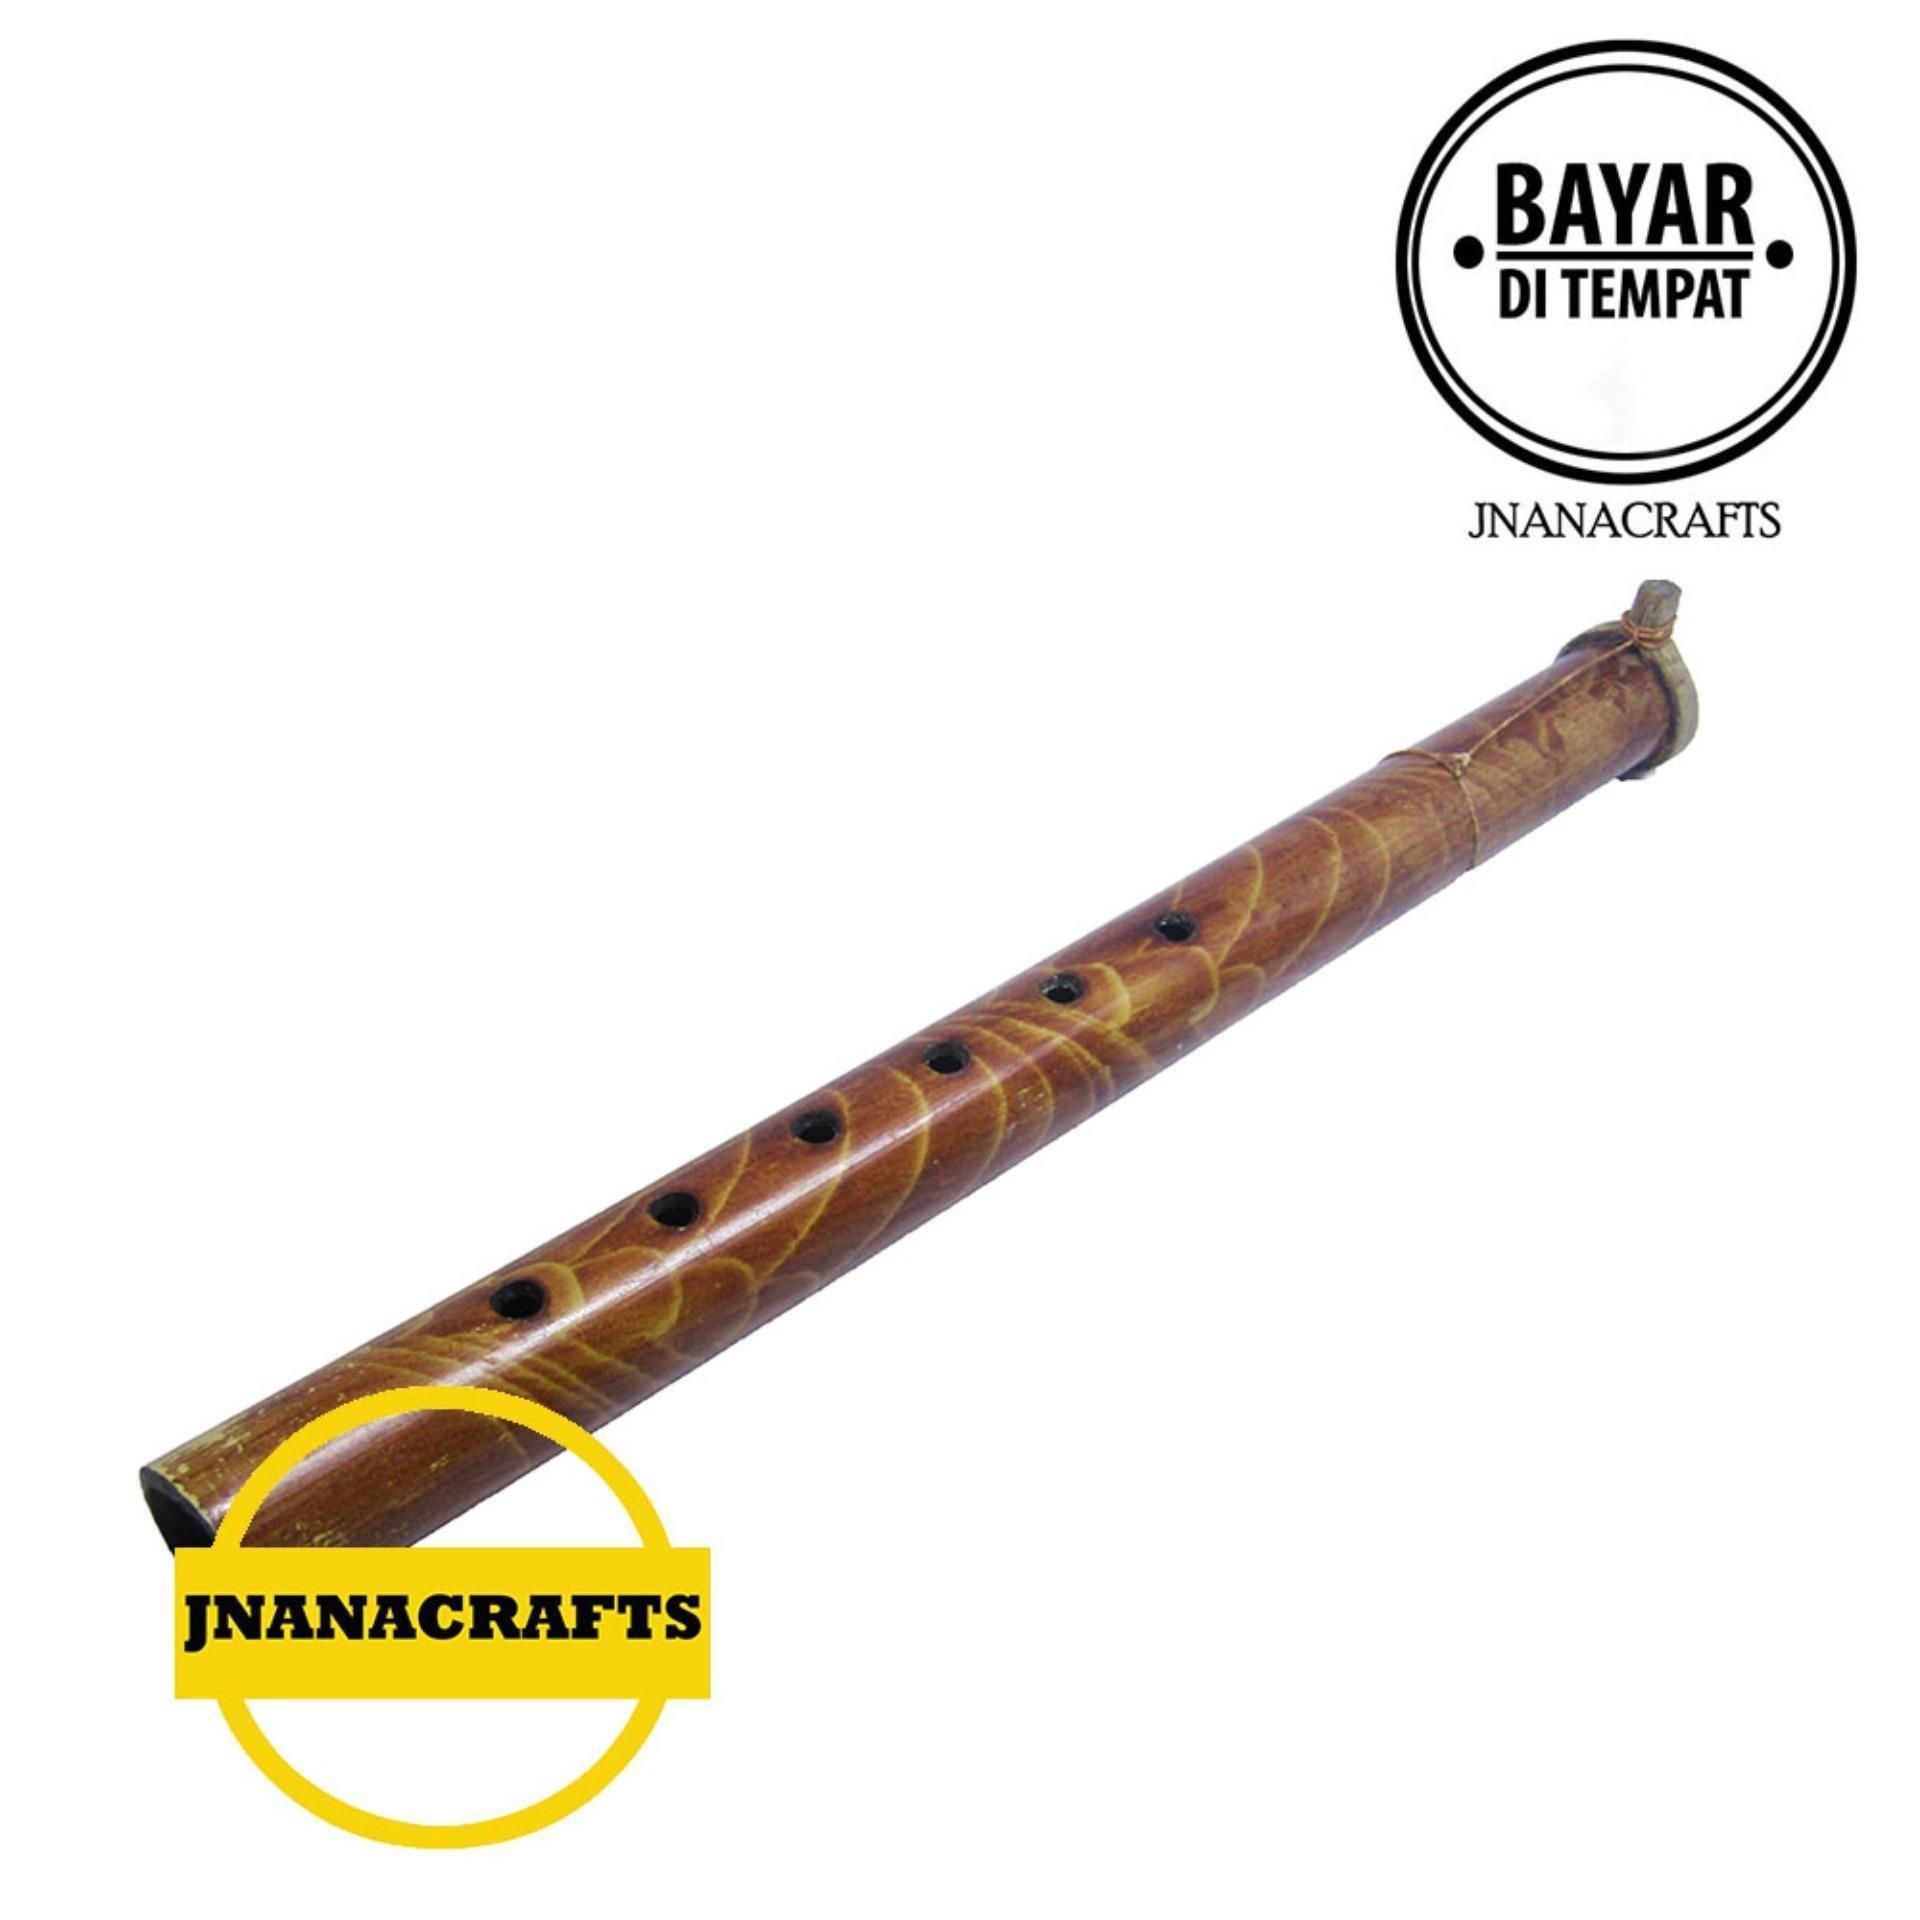 Suling Bambu Motif Simpel Besar 35cm By Jnanacrafts.